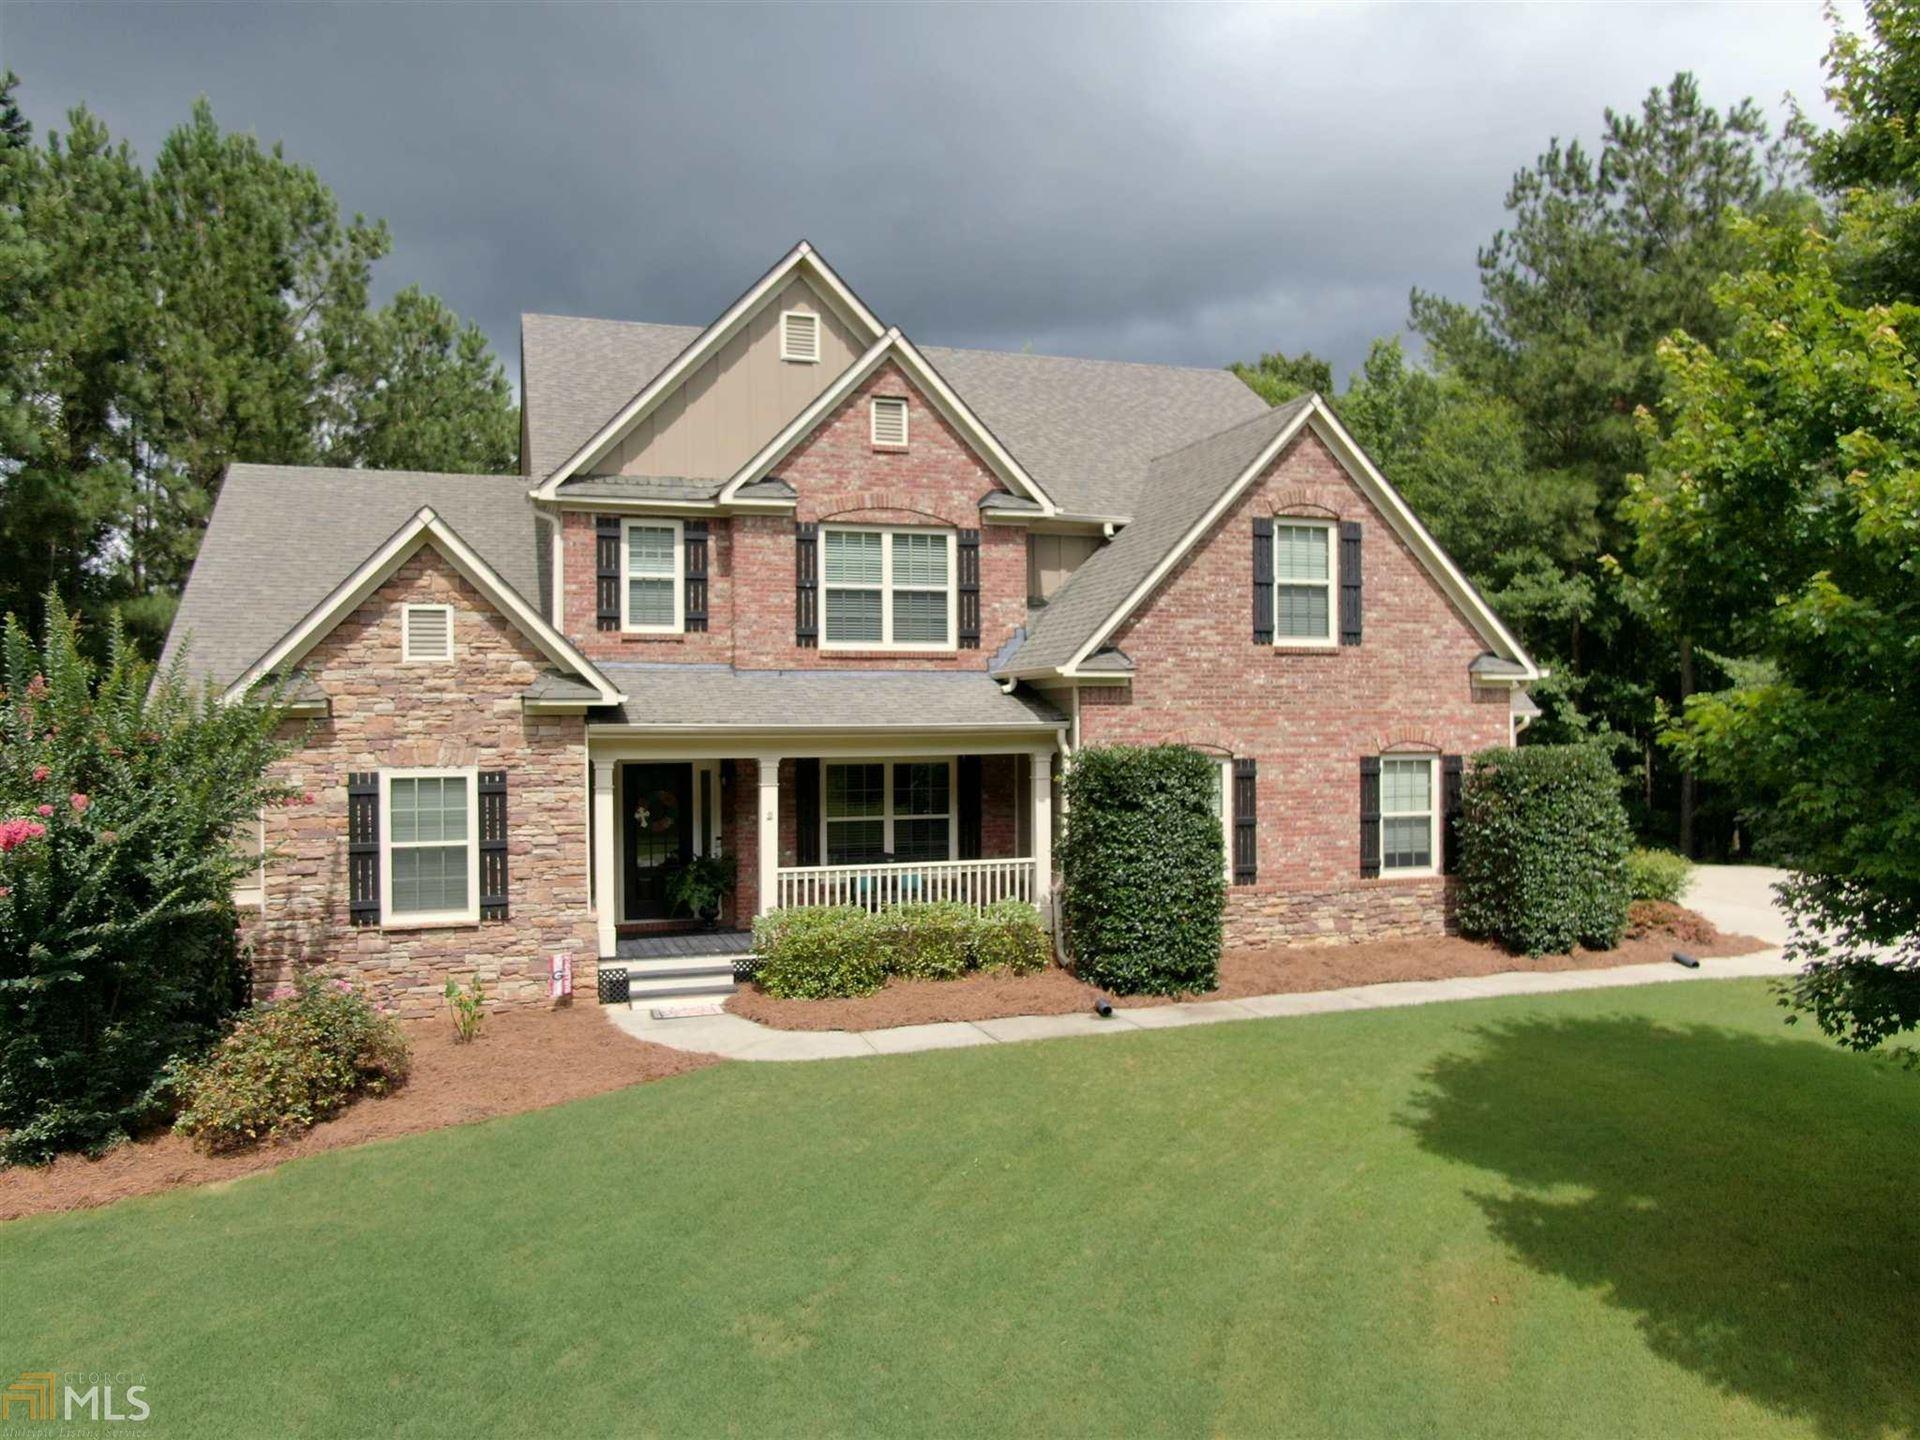 2012 Seclusion Trl, Monroe, GA 30656 - #: 8820157